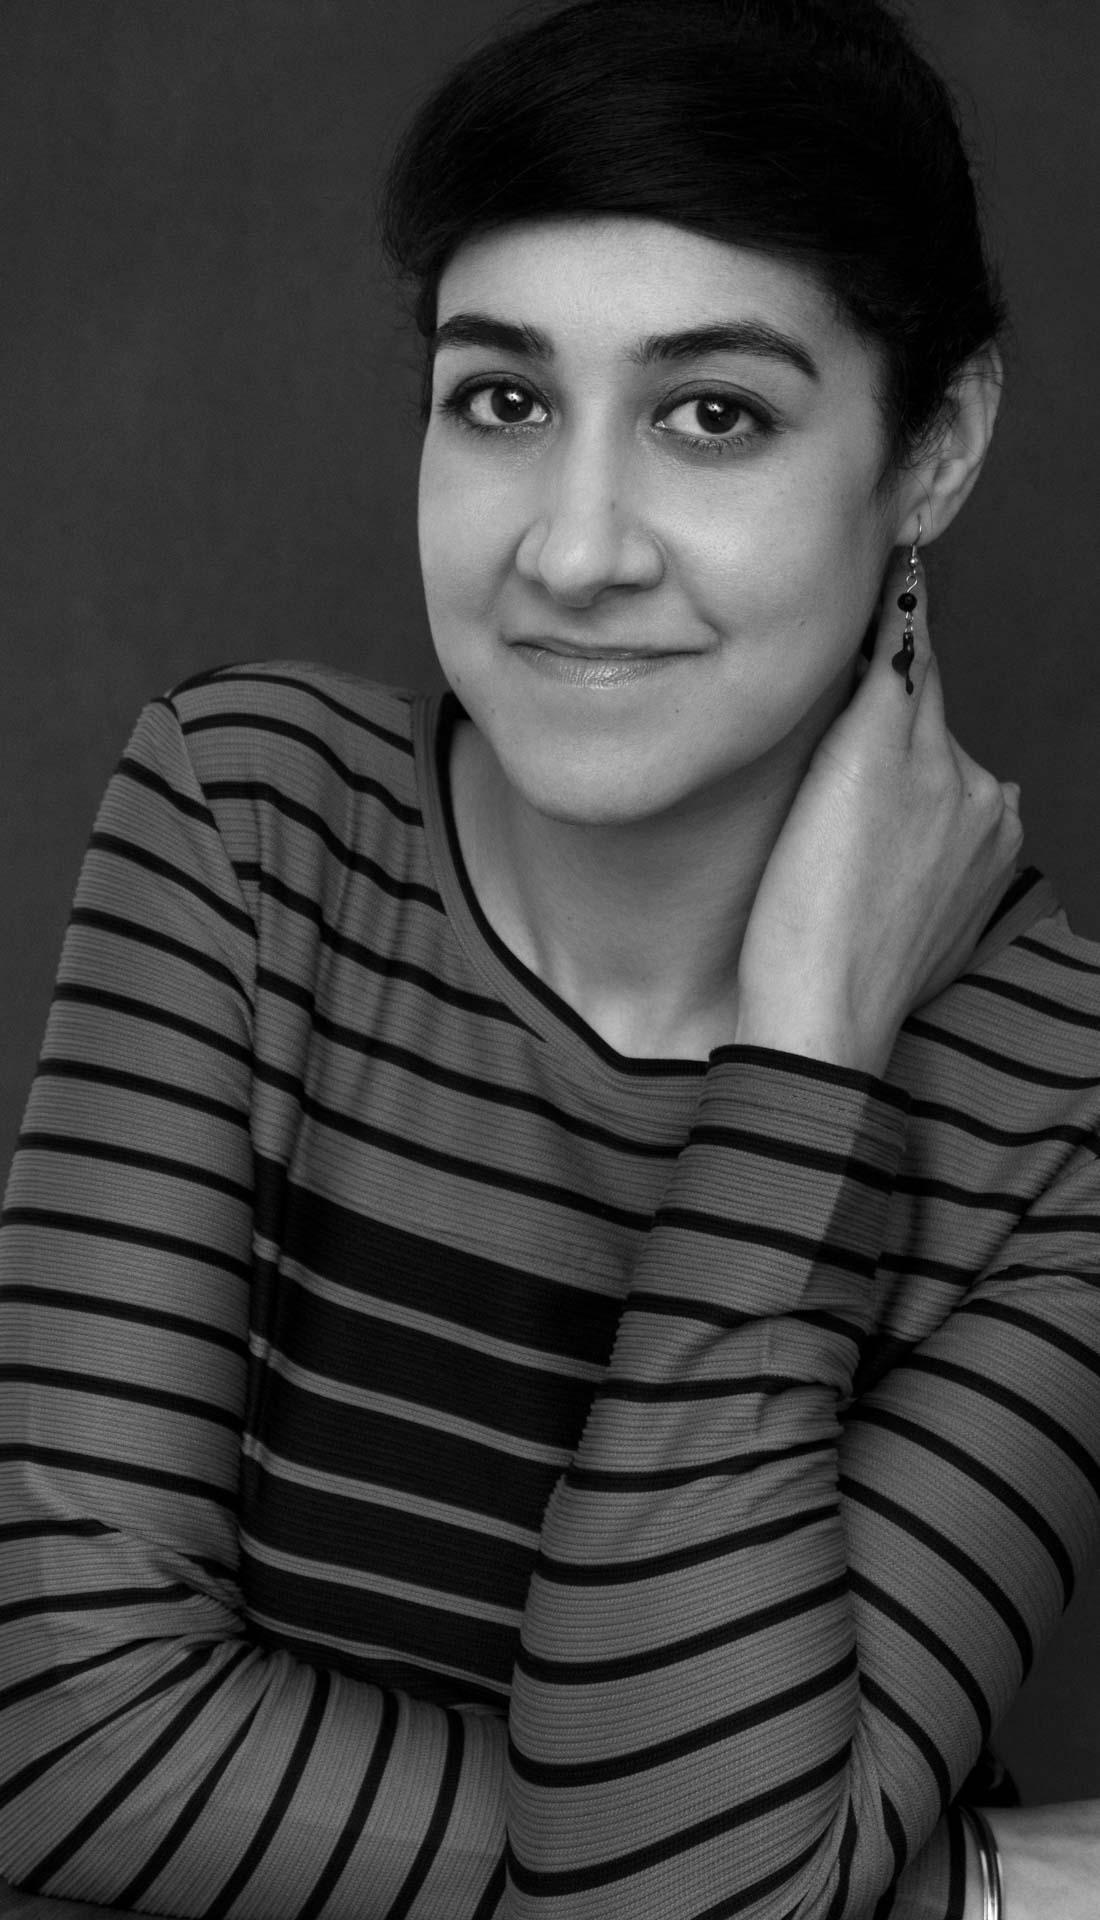 Personal Branding photography, studio headshot of a female legal executive